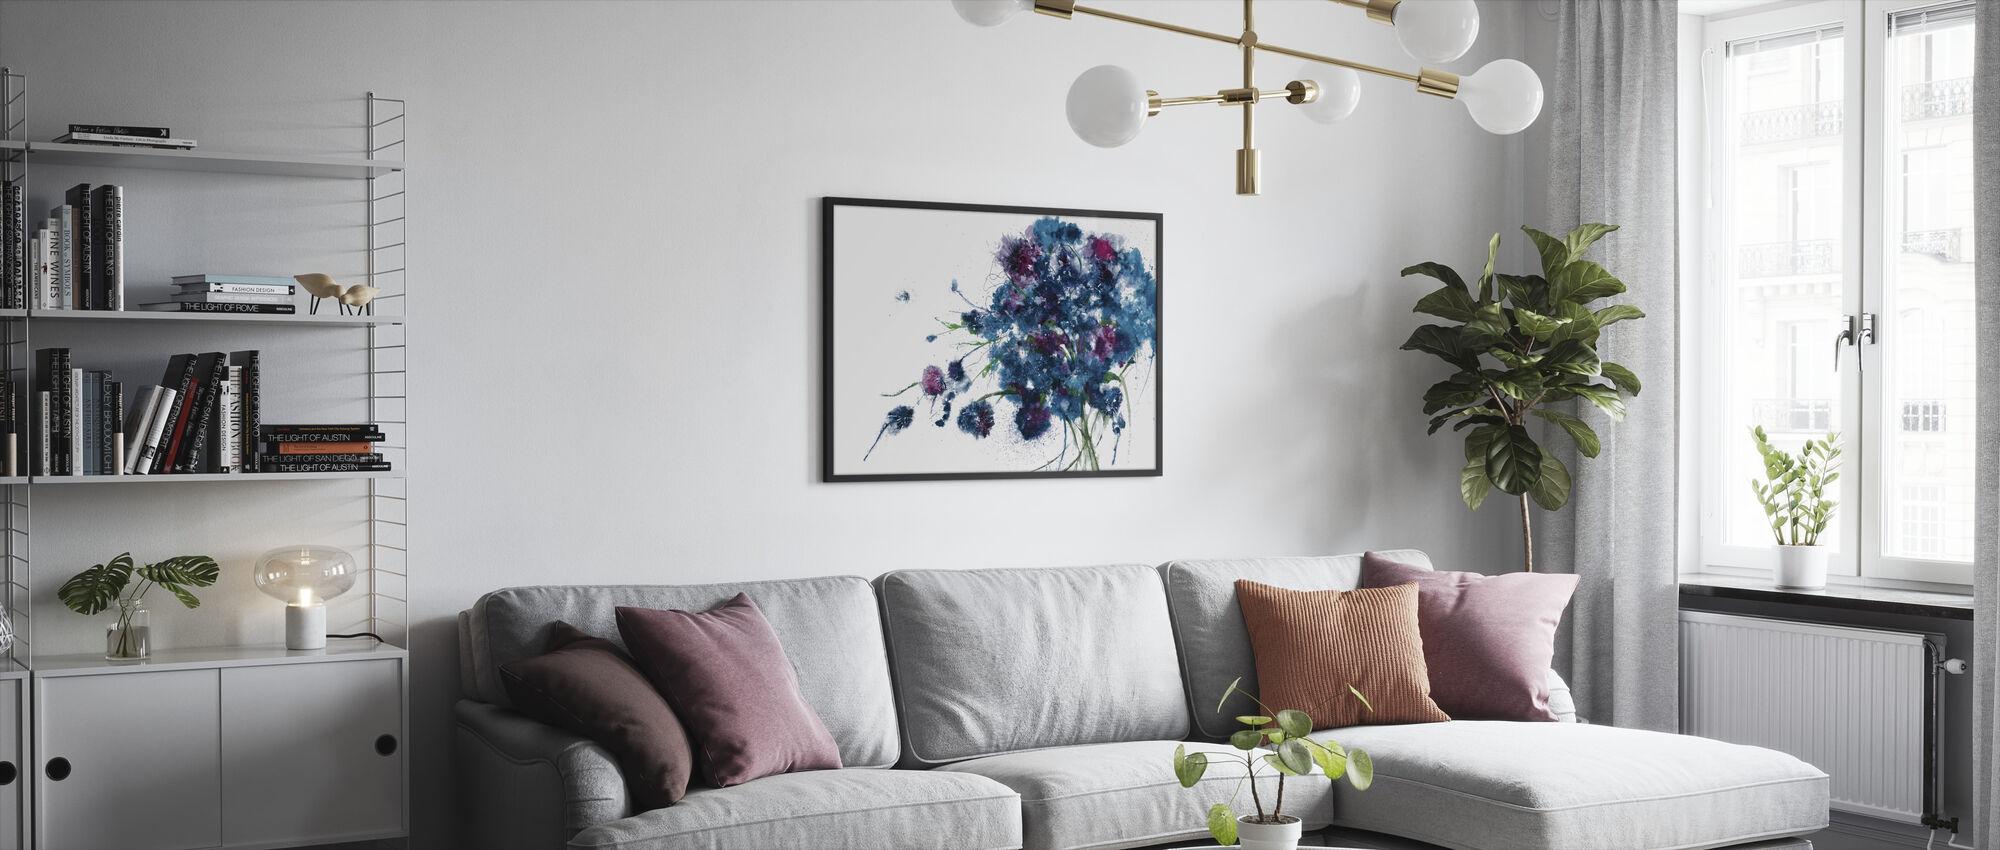 Blue Bouquet - Framed print - Living Room